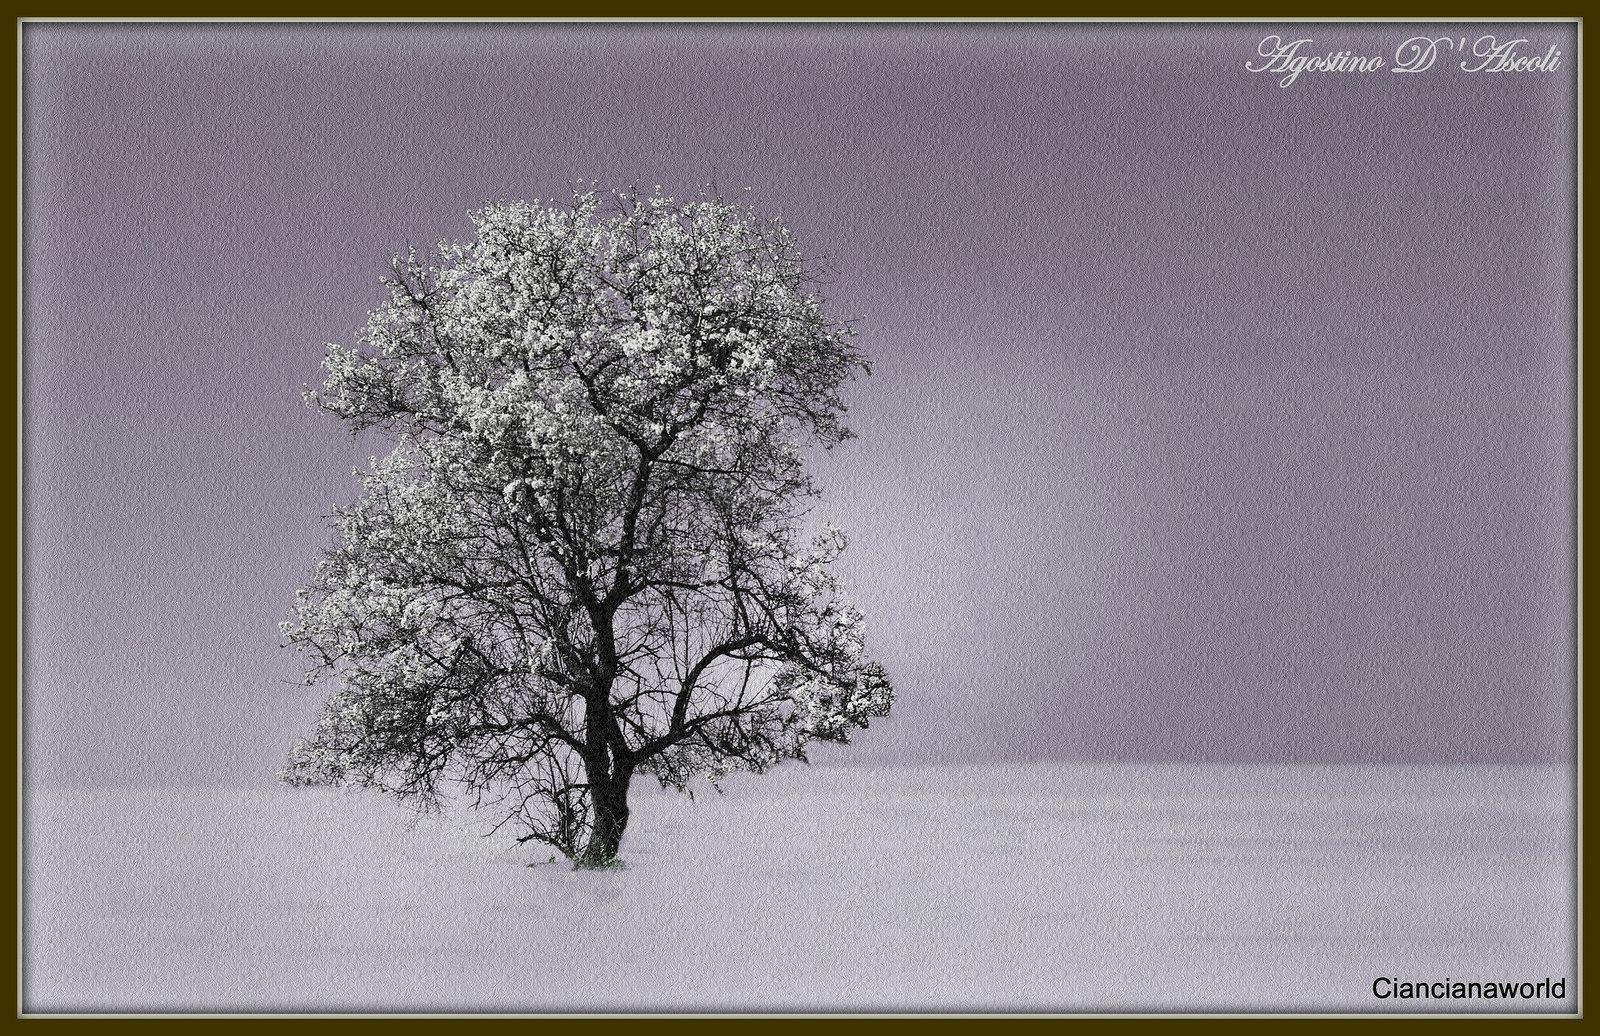 L'albero solitario - Febbraio-2016